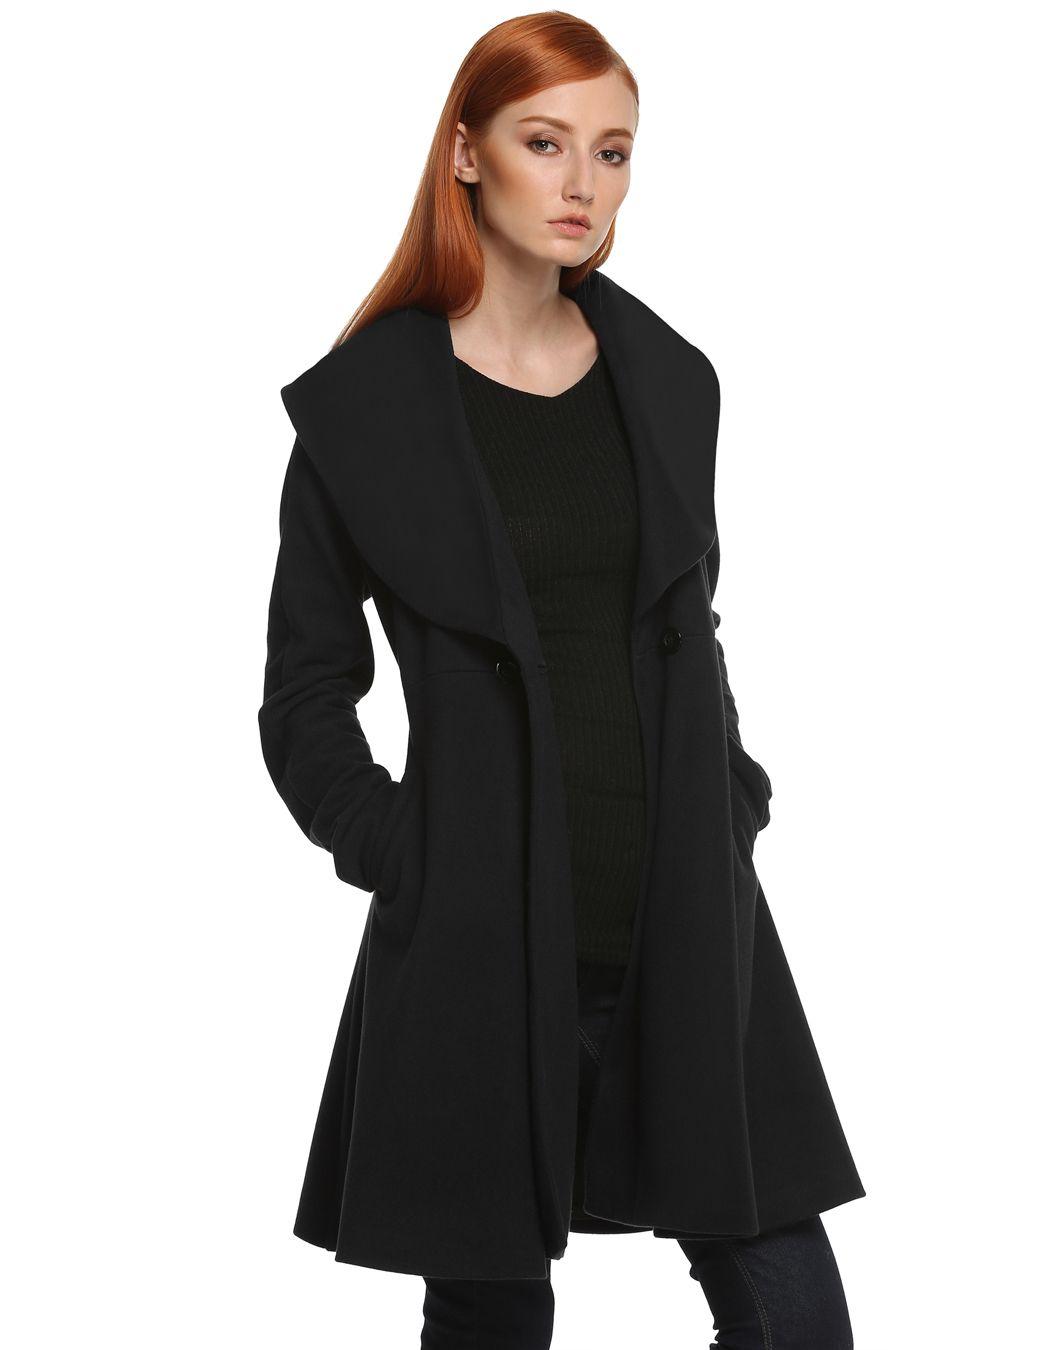 die besten 25 bergangsmantel damen ideen auf pinterest schwarzer mantel outfit schwarzer. Black Bedroom Furniture Sets. Home Design Ideas